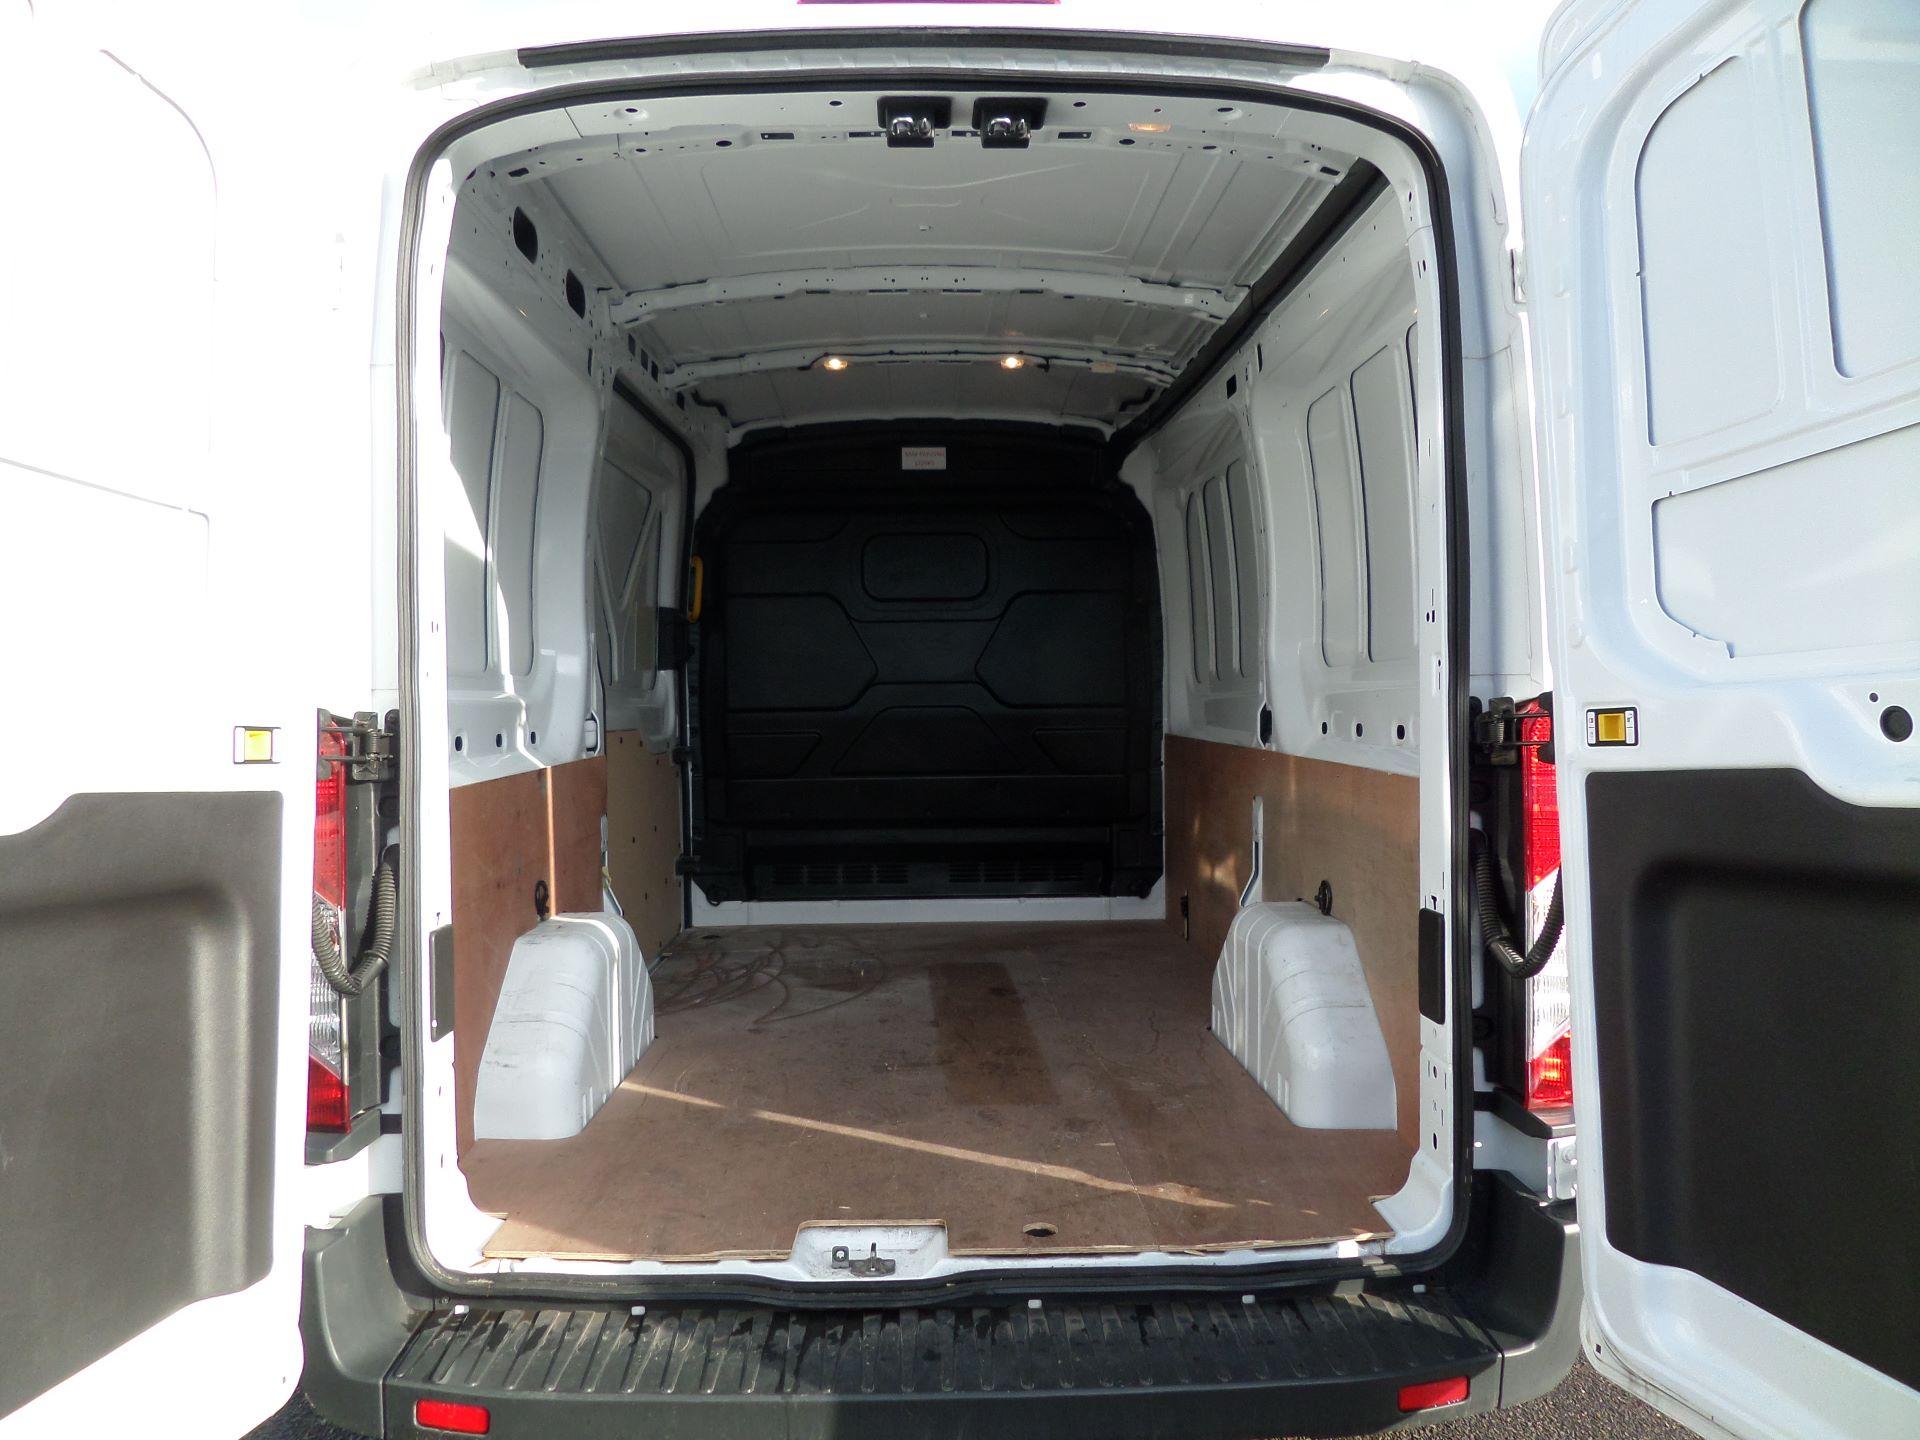 2018 Ford Transit 2.0 Tdci 130Ps H2/L2 Van Euro 6 (FE18JGO) Image 5